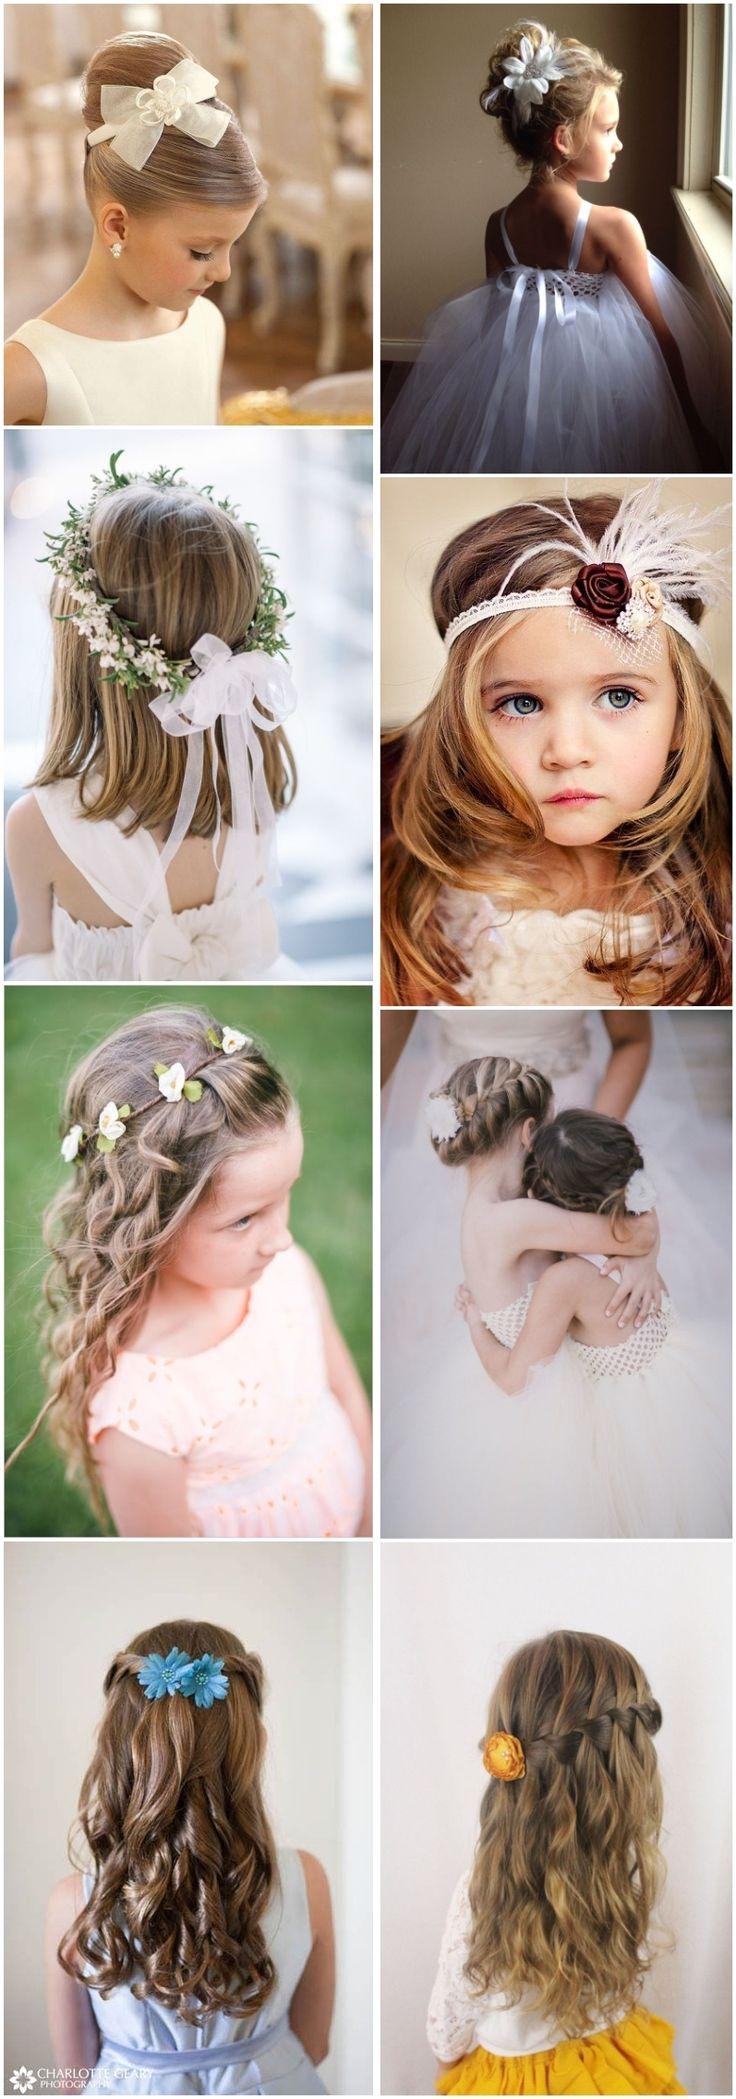 Wedding Hairstyles Cute Little Girl Hairstyles Updos Braids